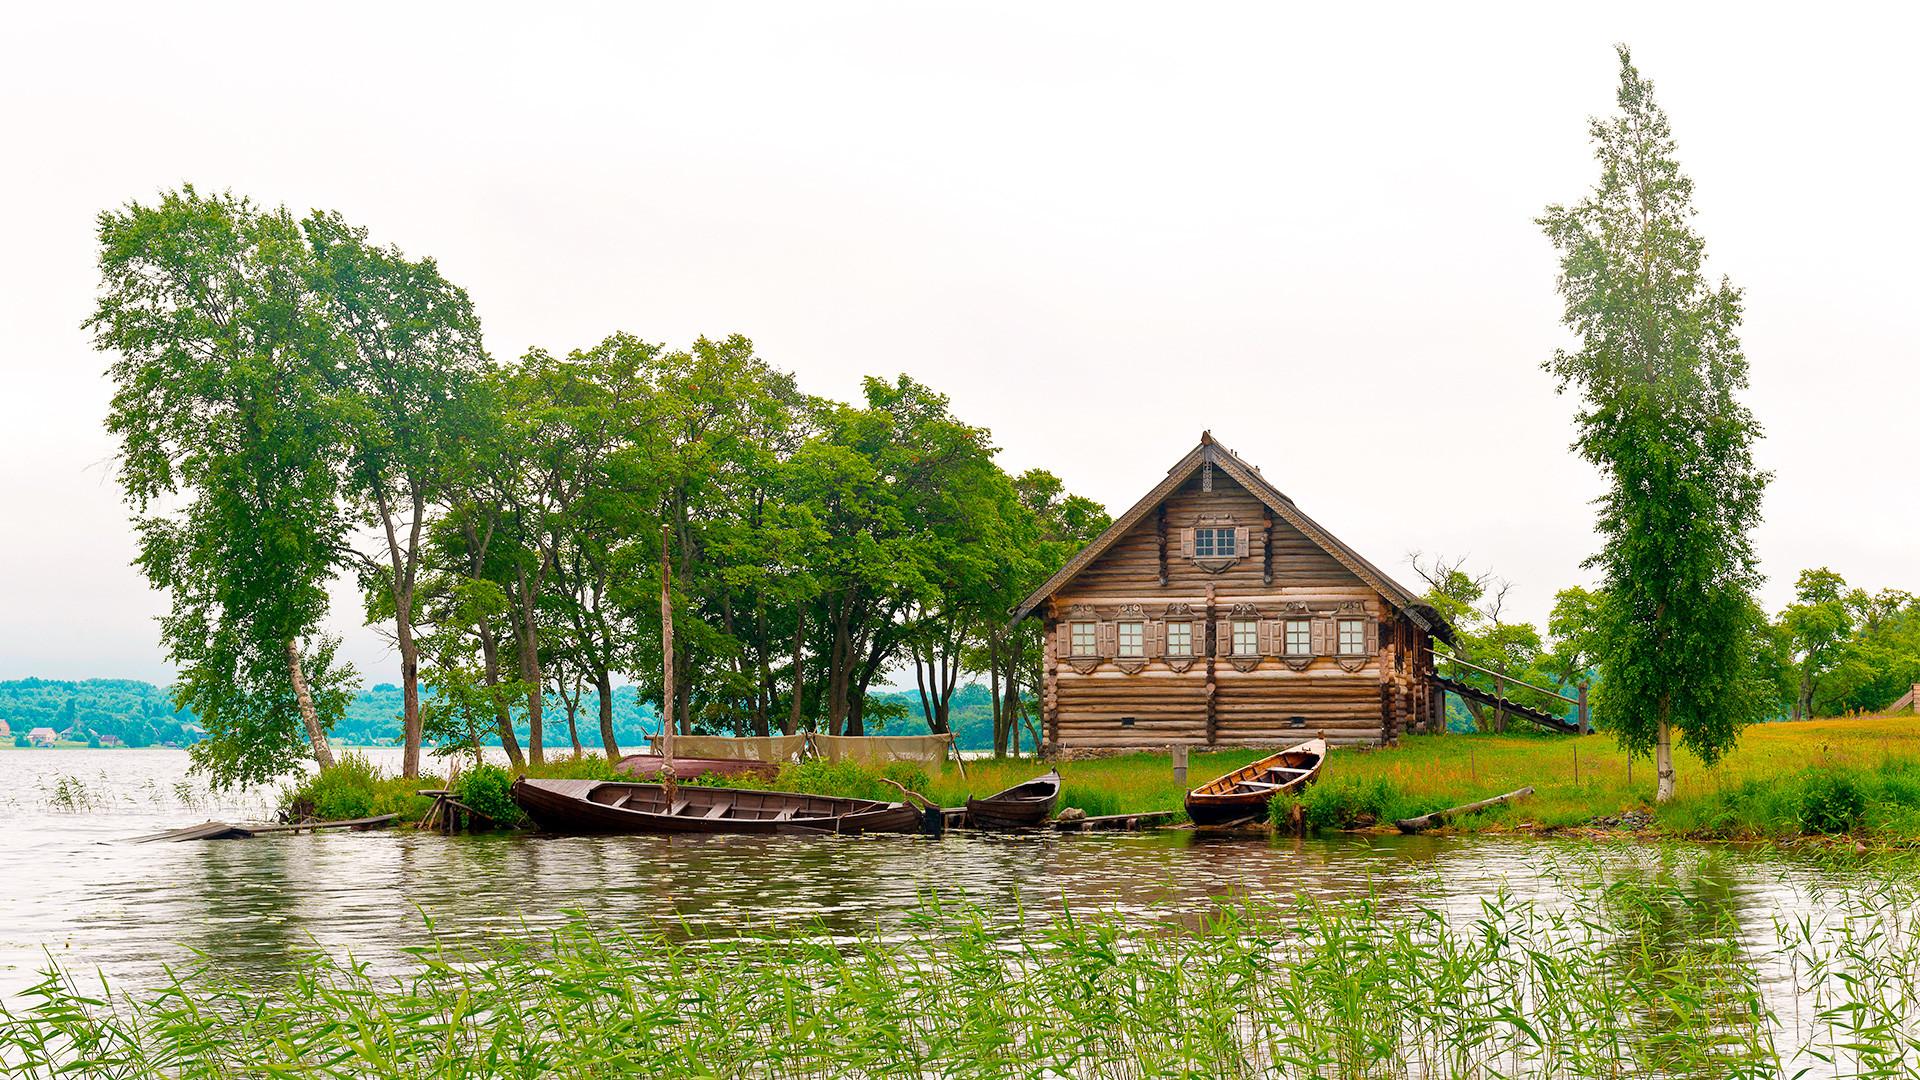 Kizhi Island on Lake Onega in the Republic of Karelia.